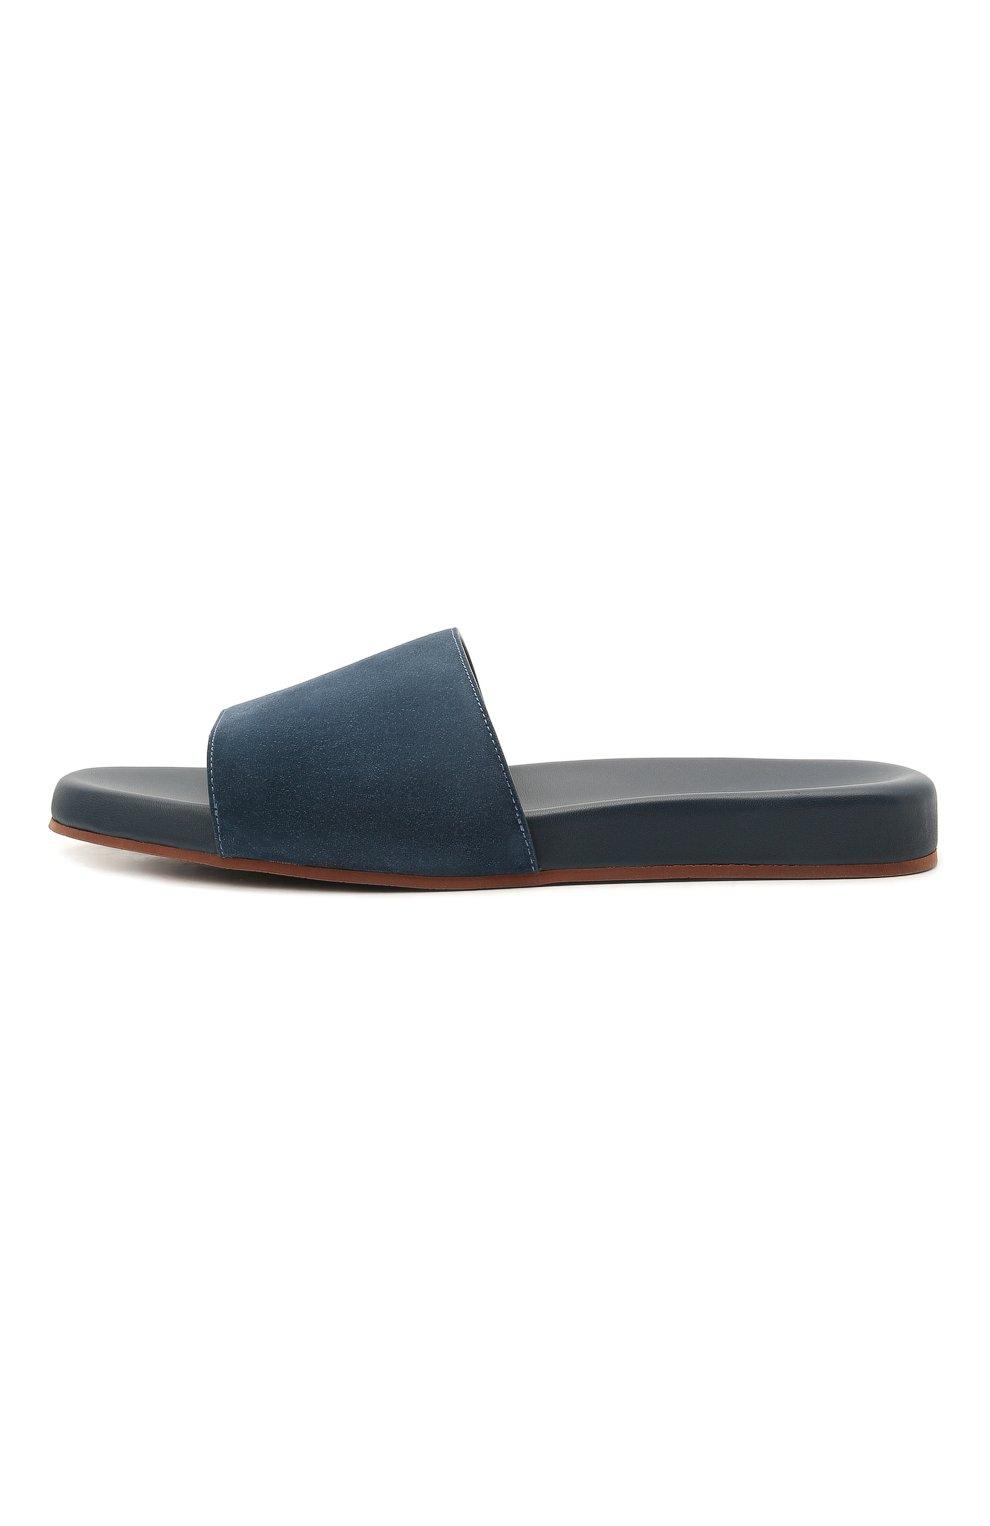 Мужские замшевые шлепанцы sea-slide LORO PIANA синего цвета, арт. FAI4870 | Фото 3